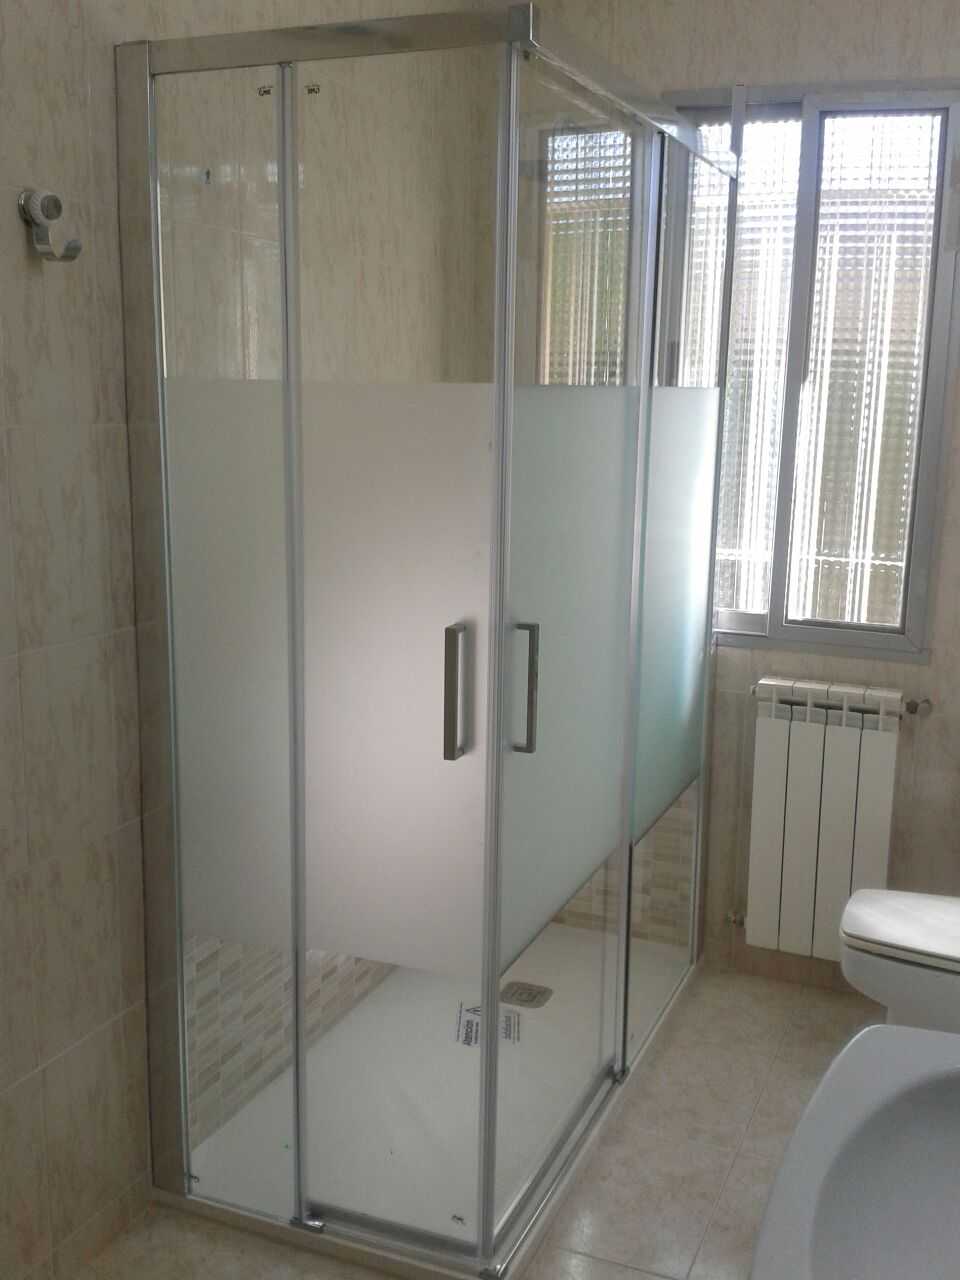 Cambio de ba era por ducha con mampara contra ventana - Modelos de mamparas de ducha ...